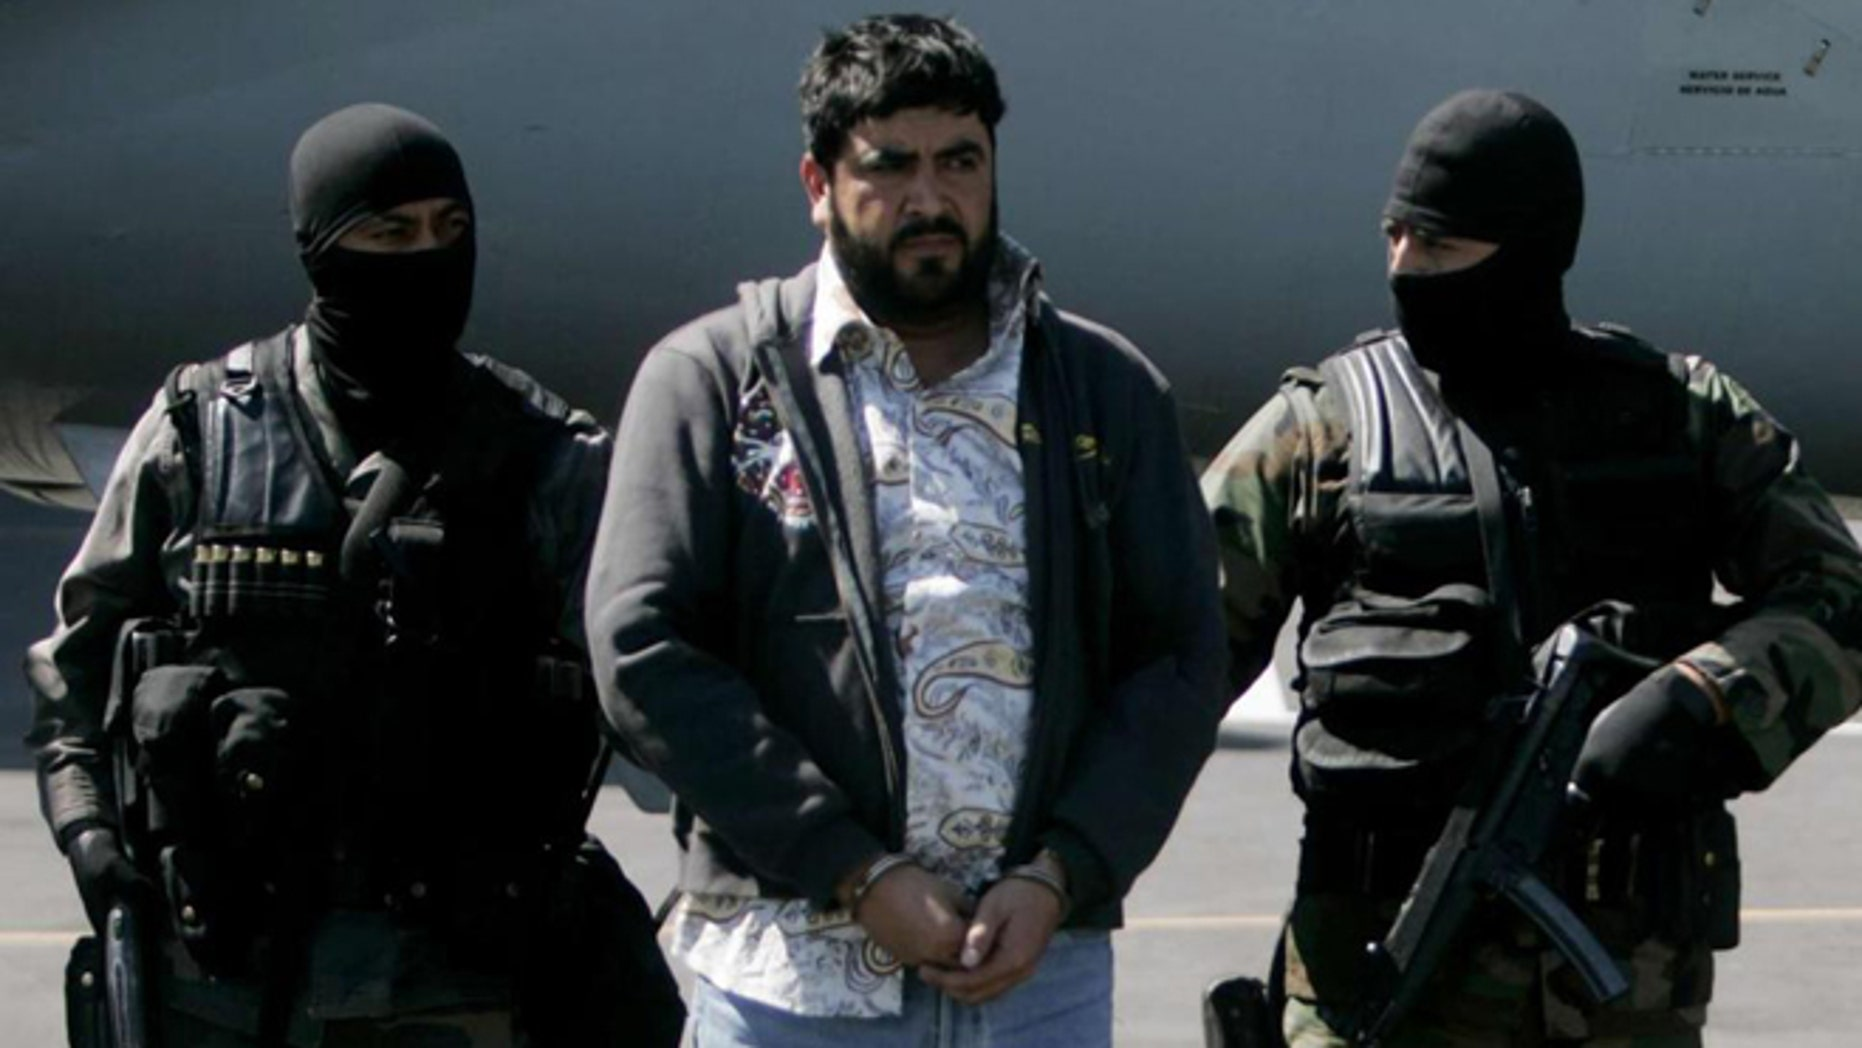 Alfredo Beltran Leyva is escorted through Mexico City Airport in 2008. (Photo: EDUARDO VERDUGO/ASSOCIATED PRESS)